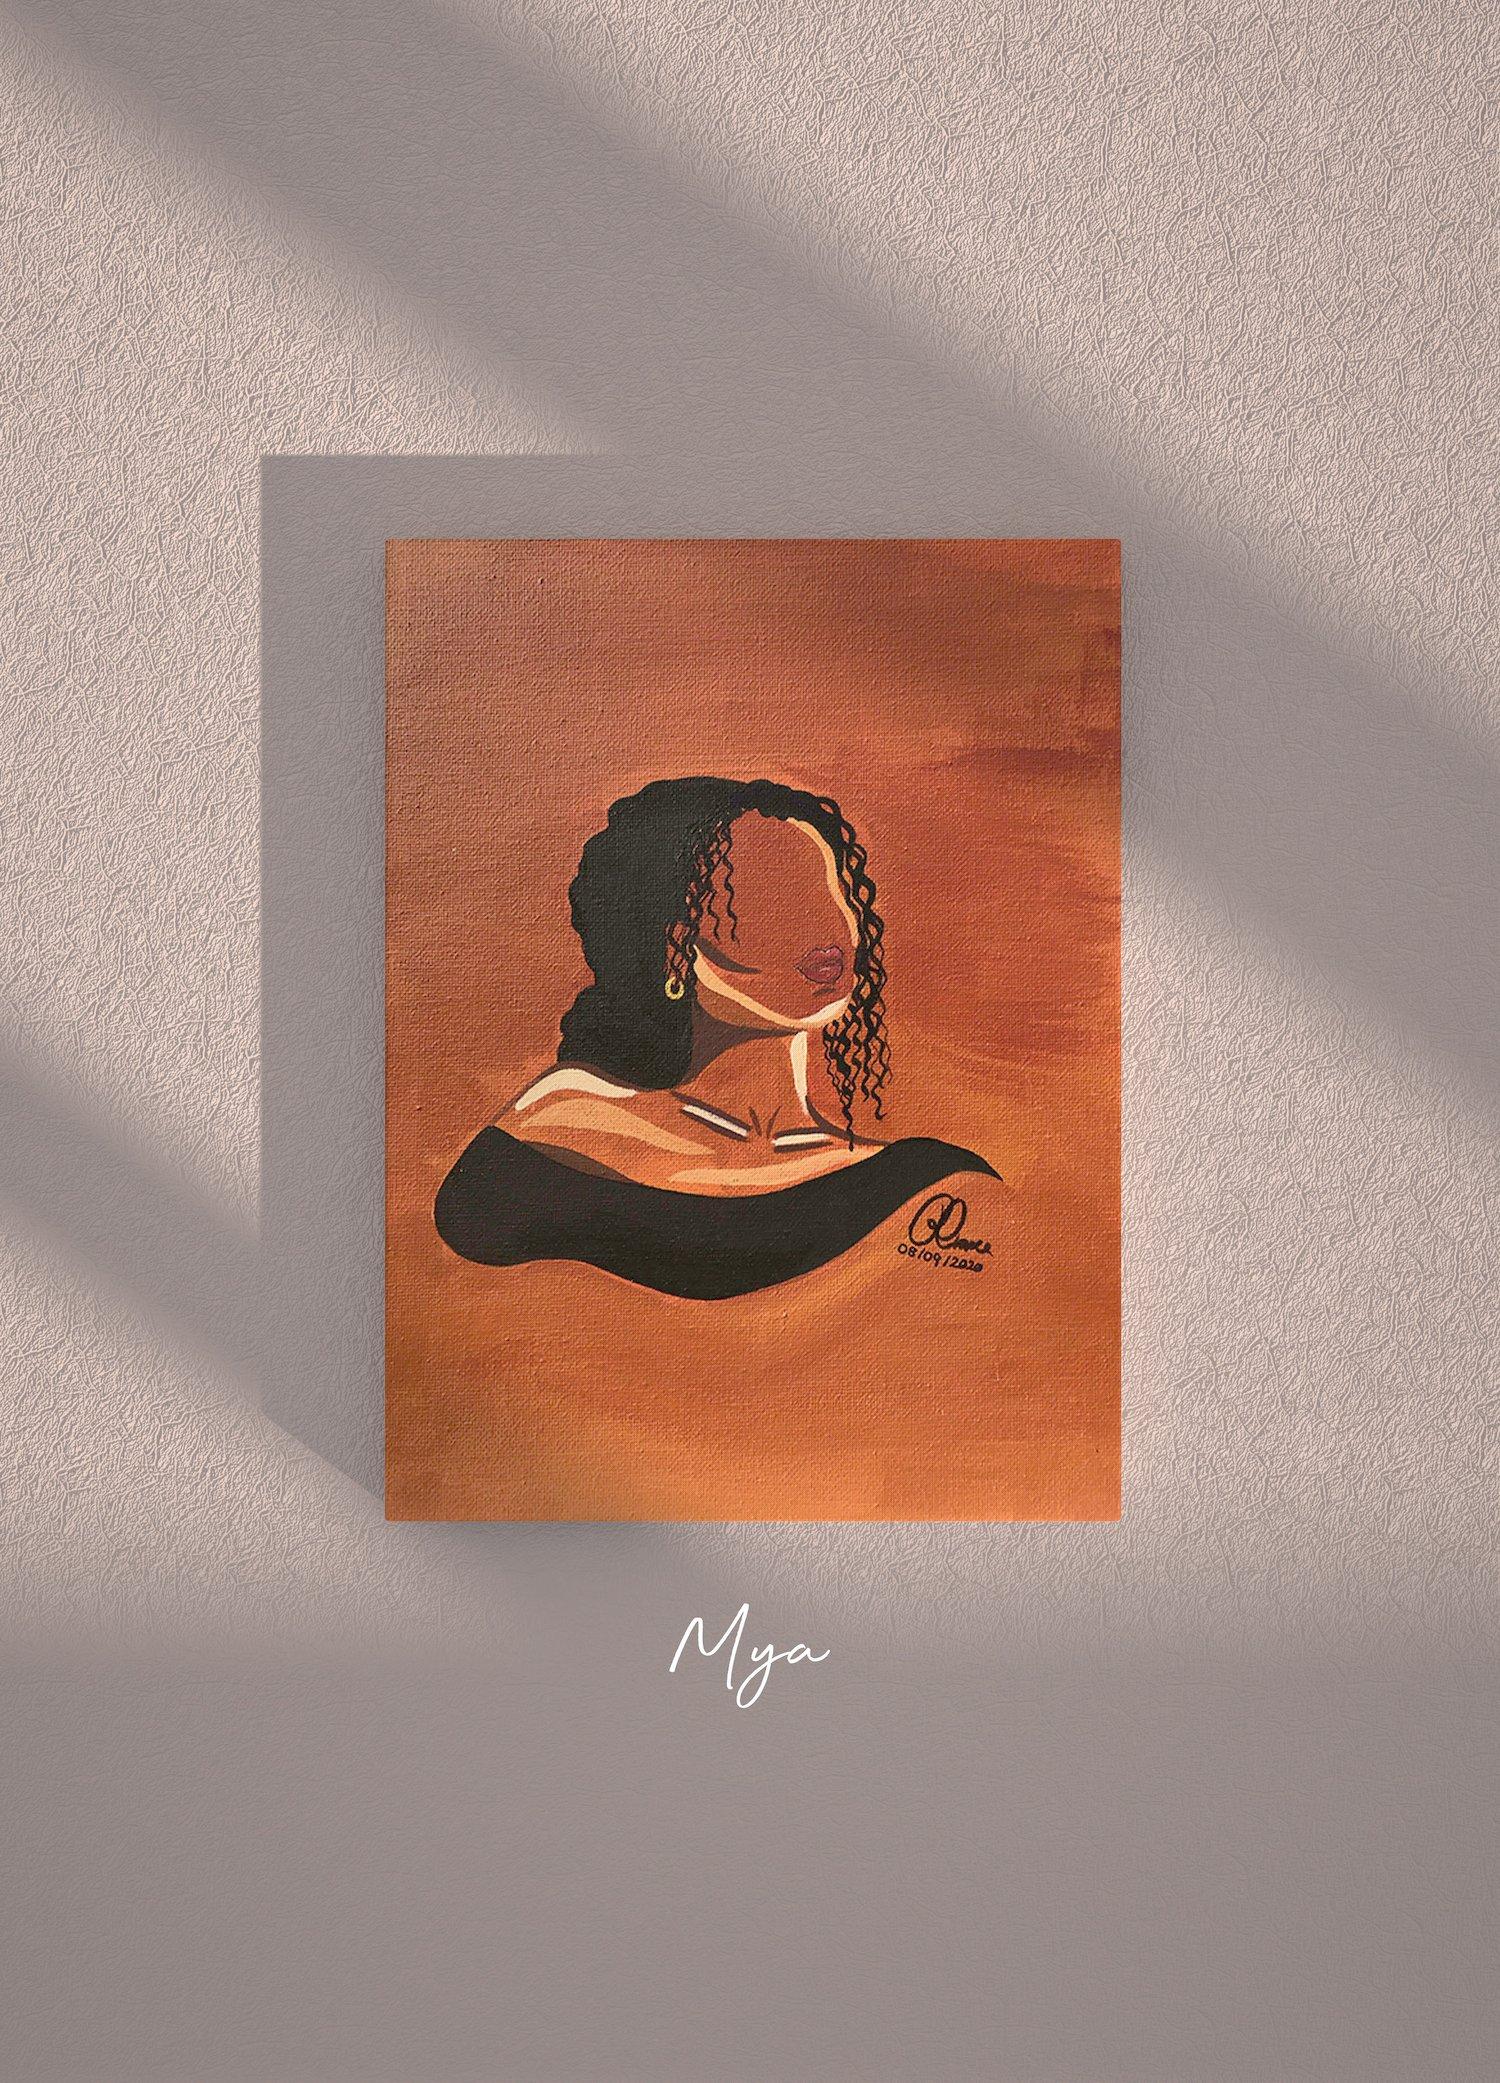 "Image of Mya | Black Girl Series | 9x12"" Acrylic Painting on Canvas"